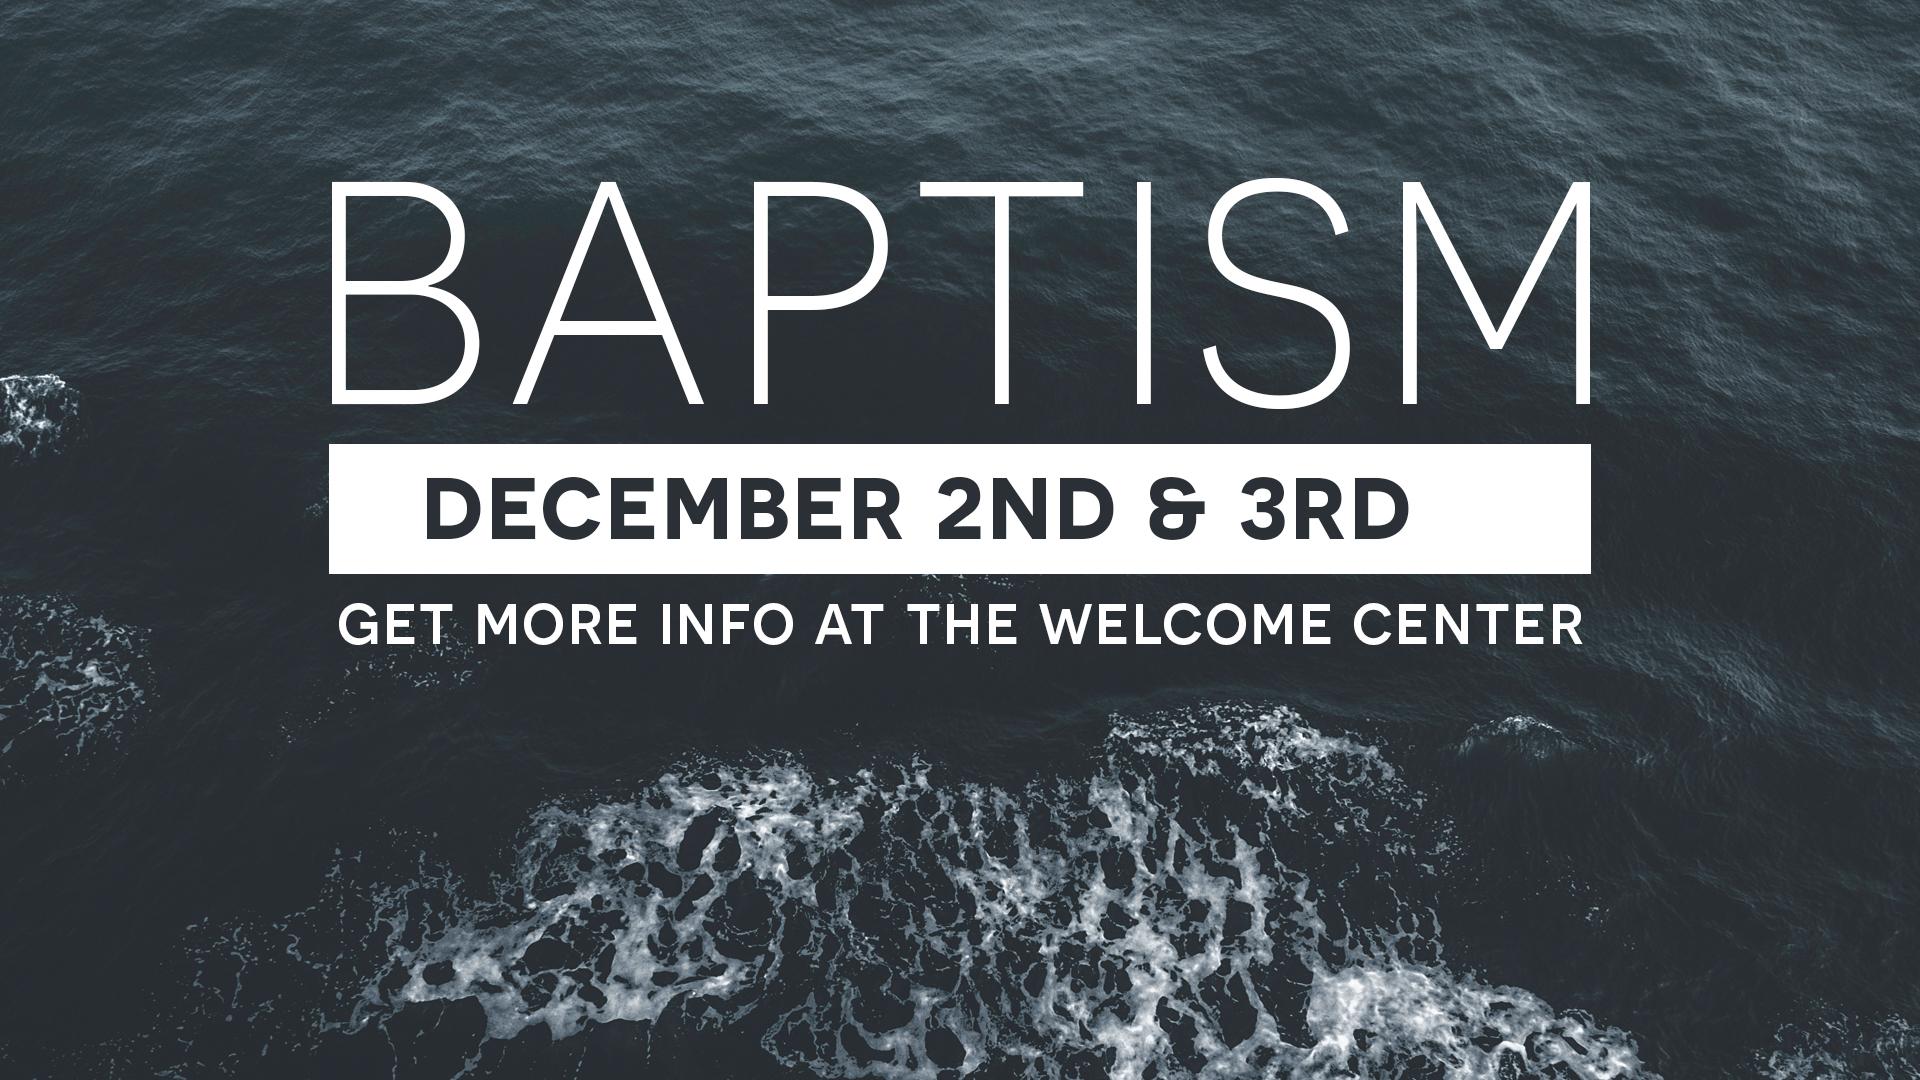 baptism 1080.jpg